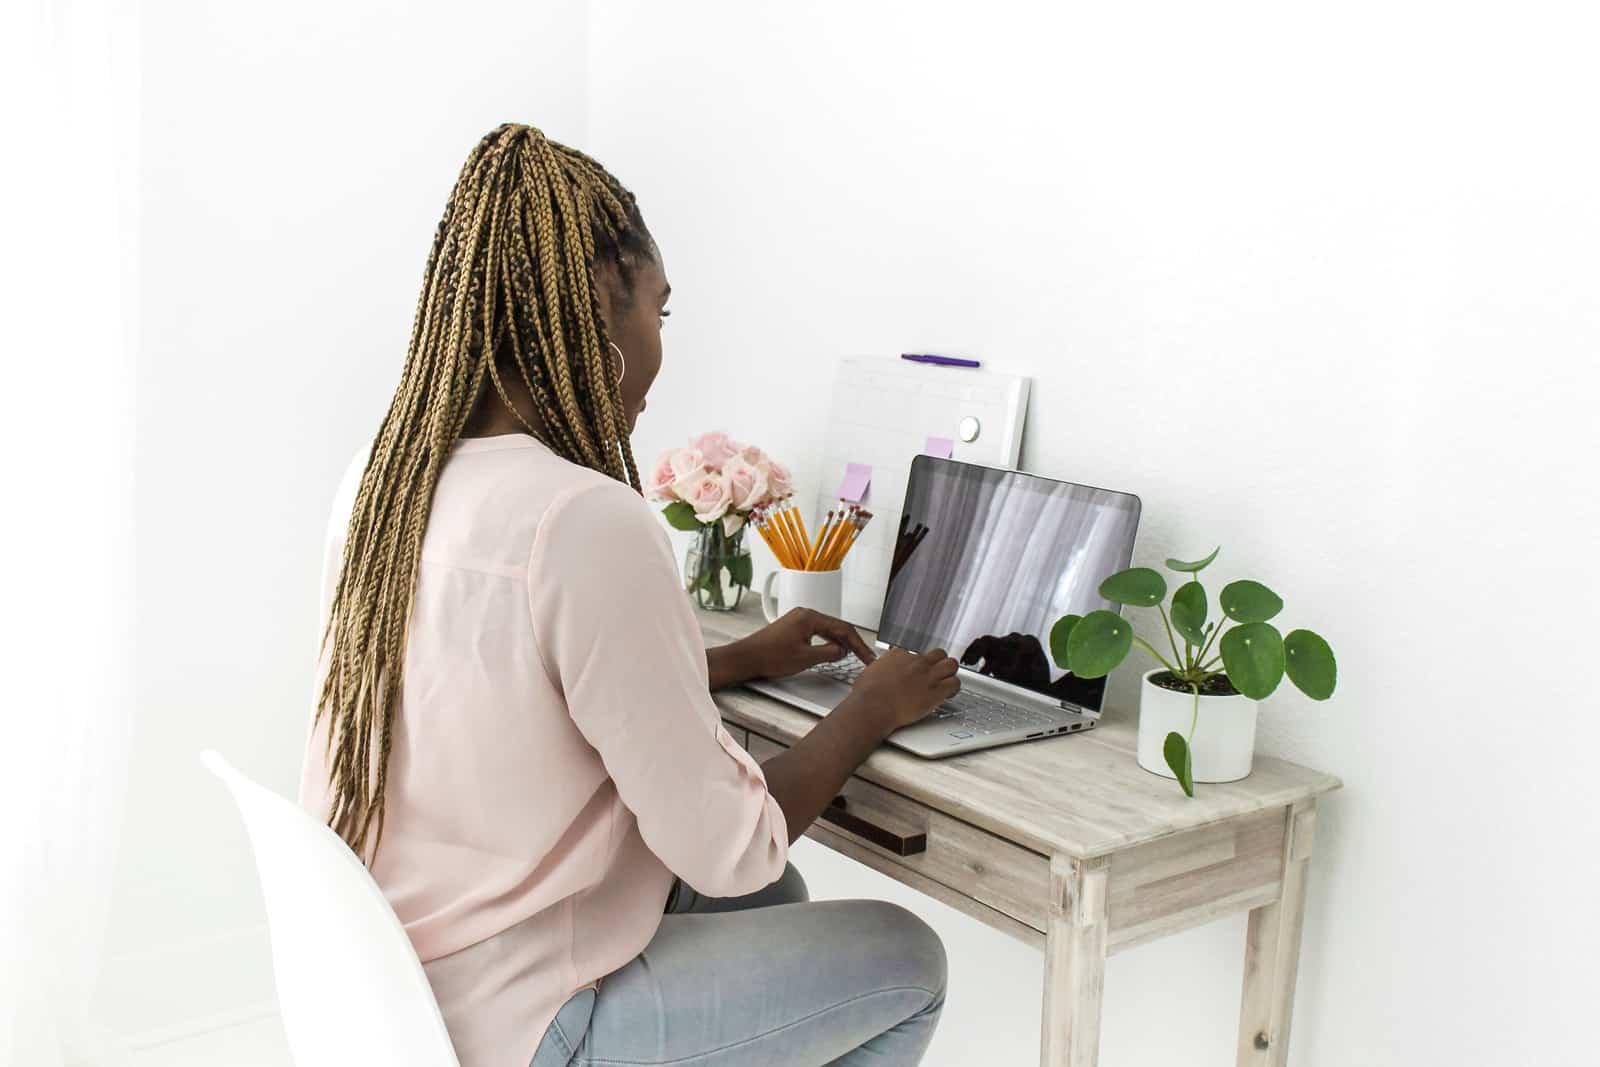 improve blog writing skills